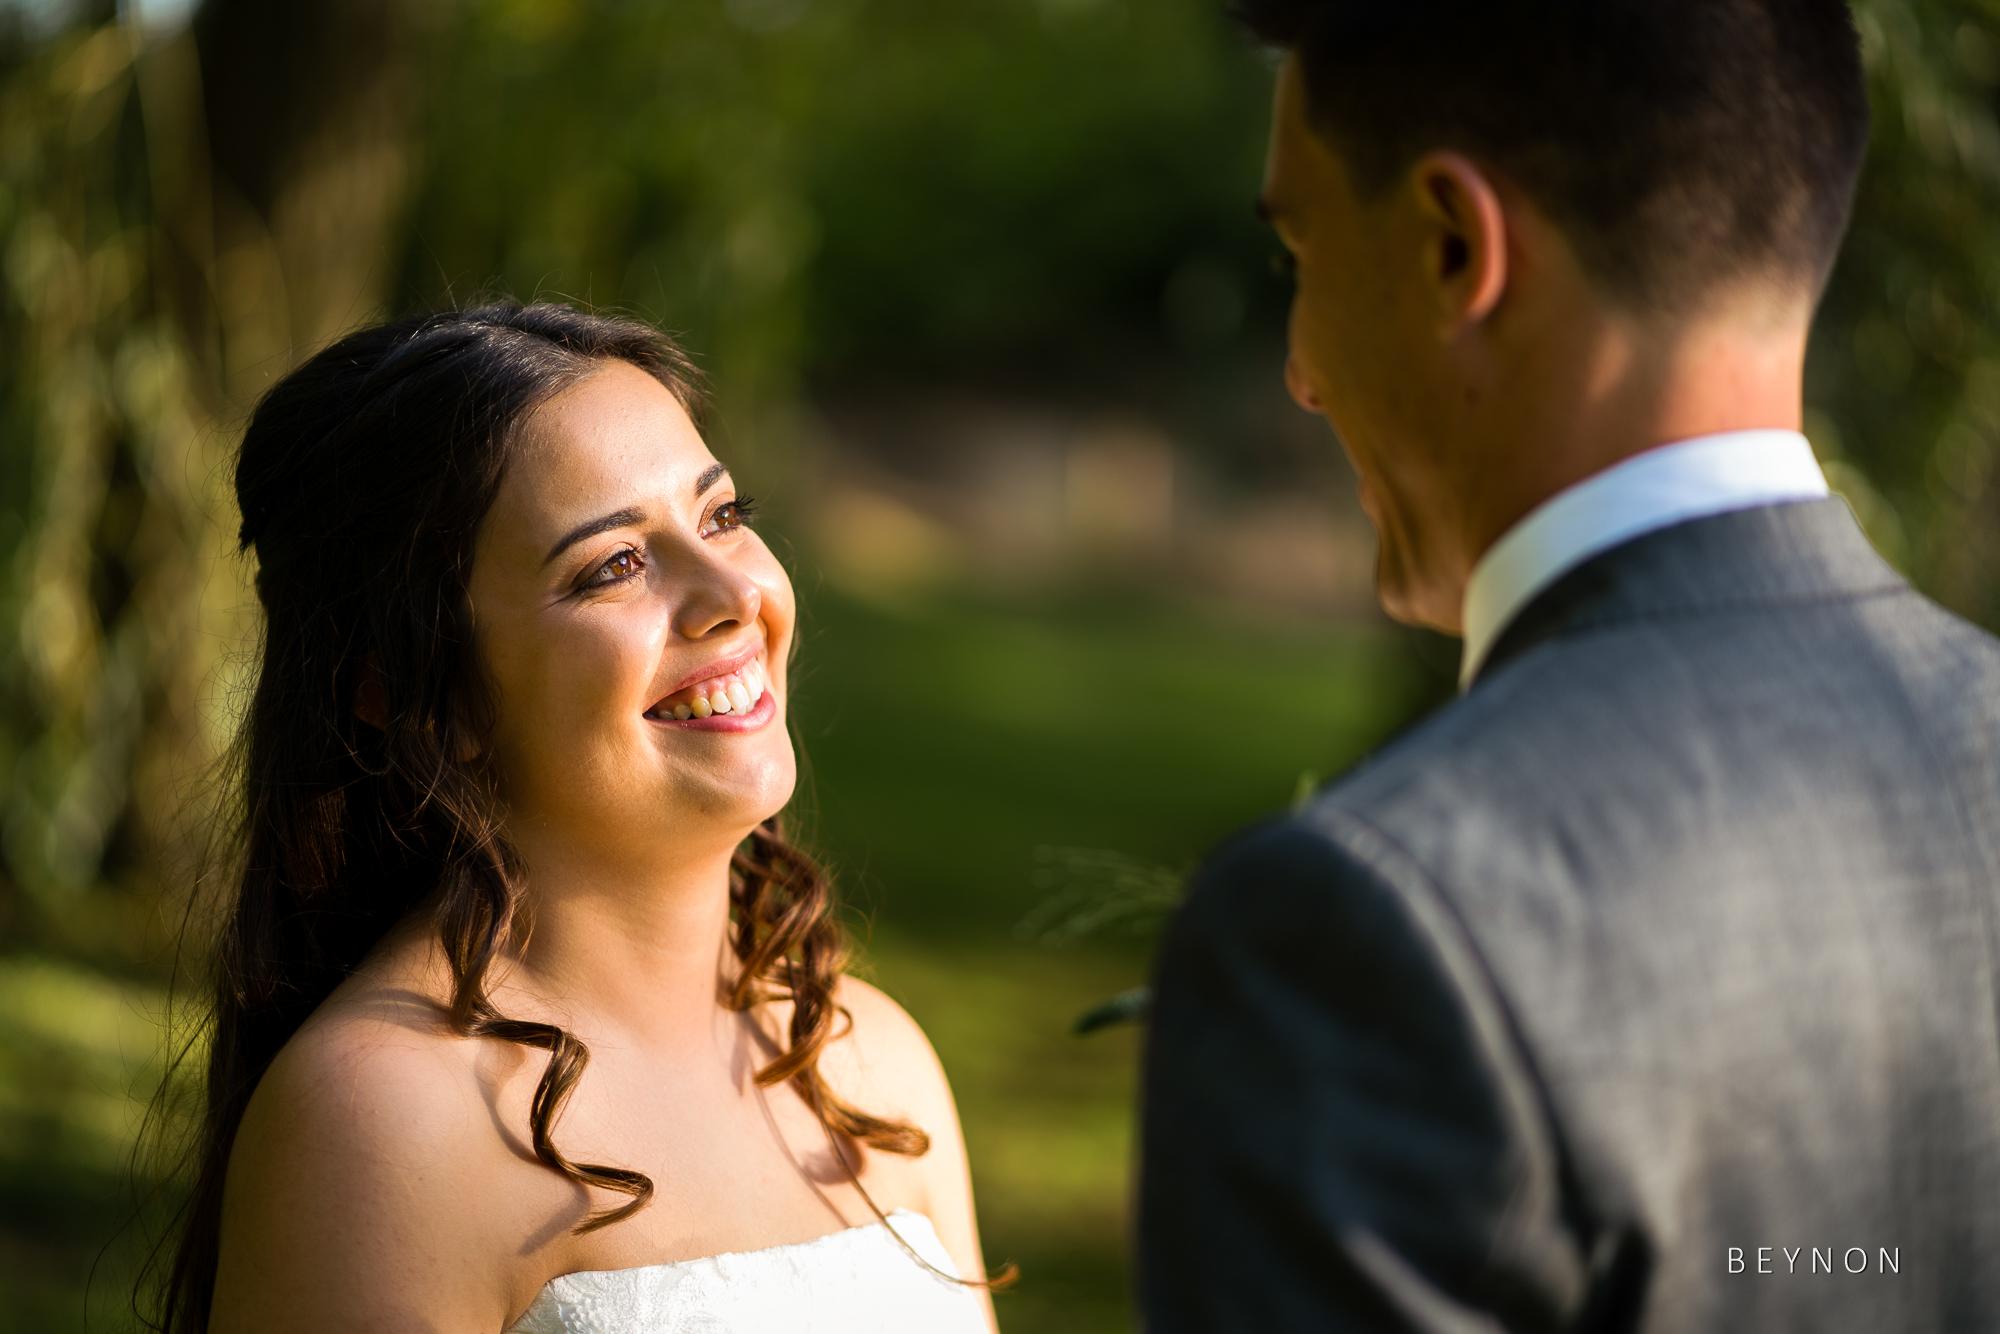 The bride smiles